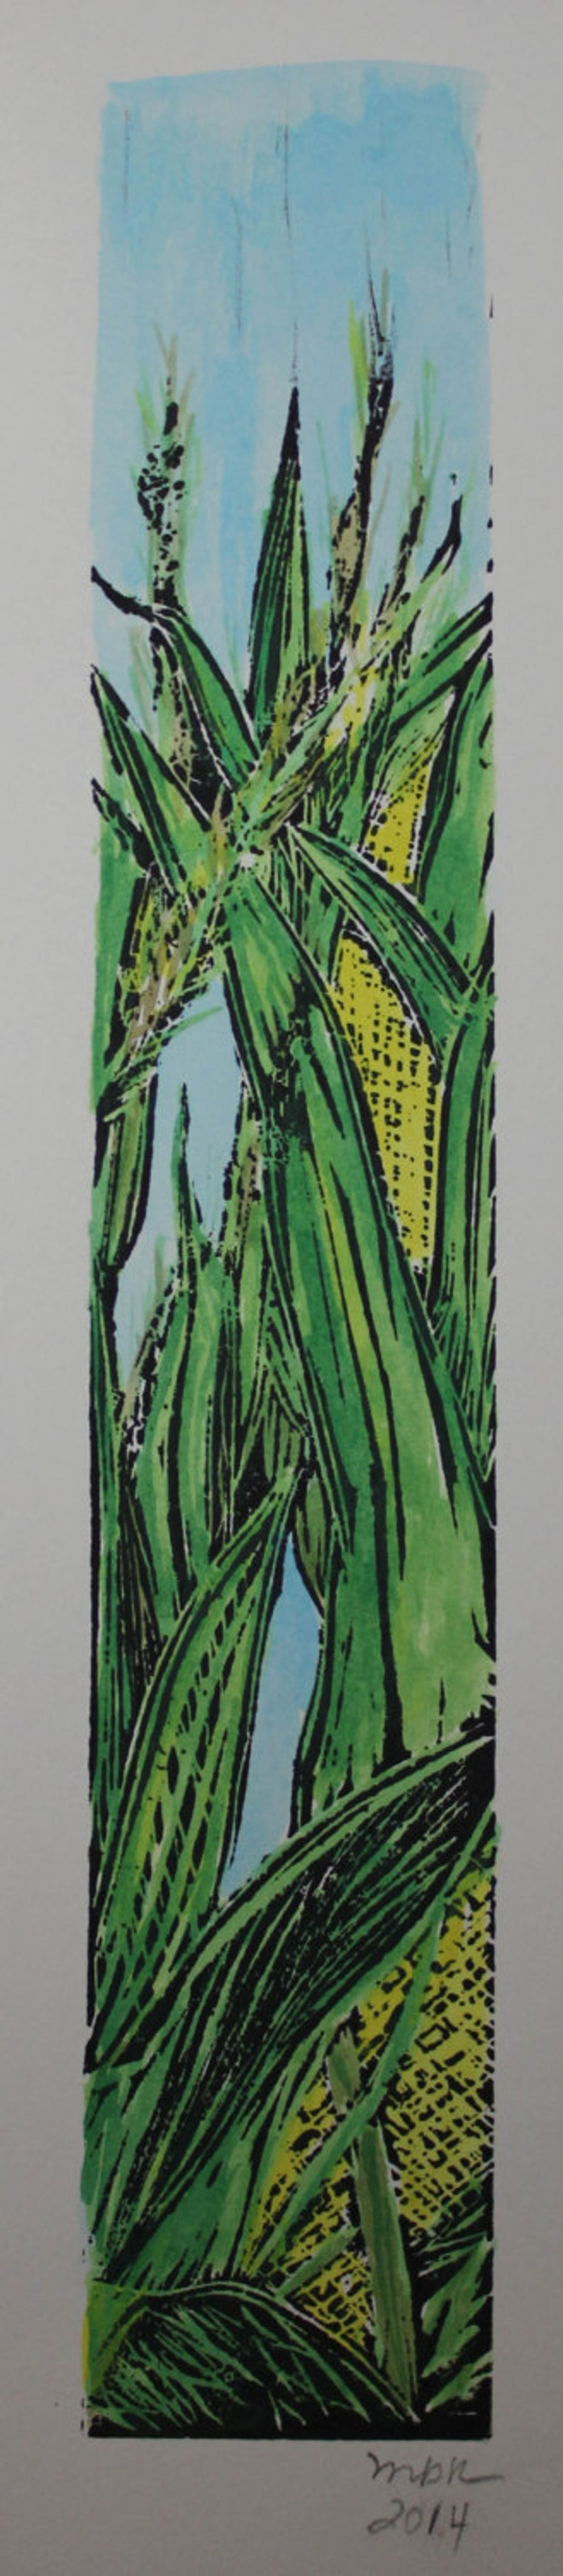 Corn Card / Bookmark Linocut image 1